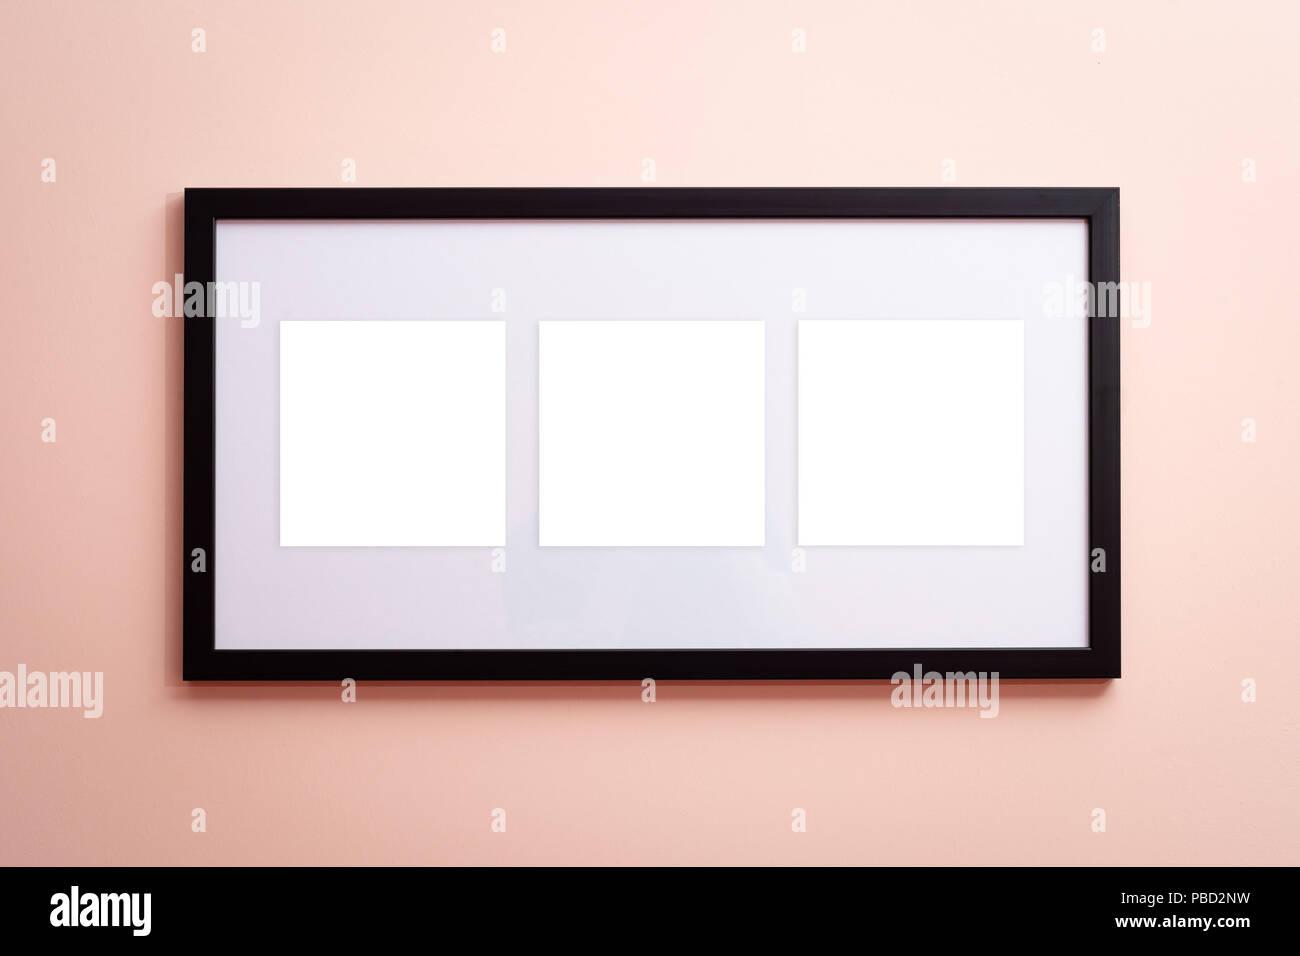 Eine leere Leinwand, schwarzen Rahmen Rahmen mit drei leeren Räume ...